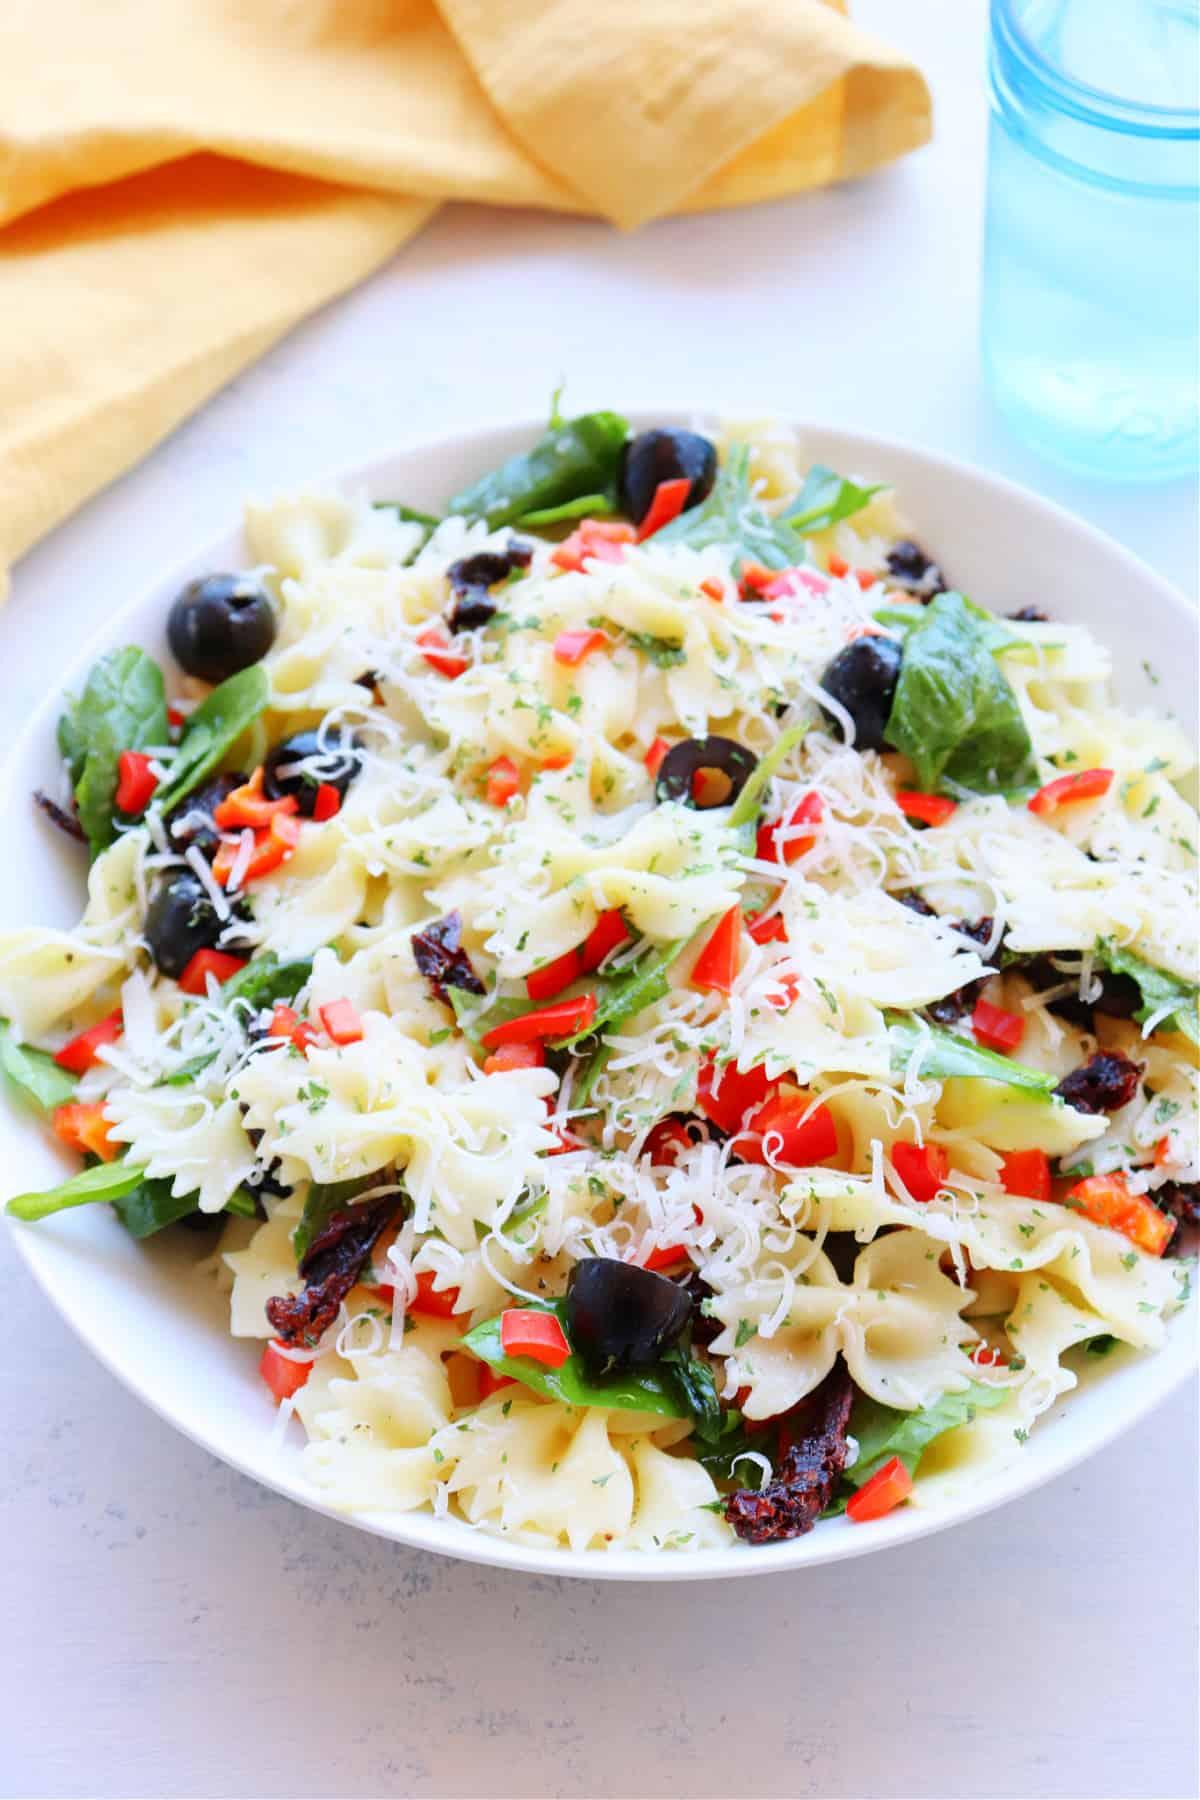 tuscan pasta salad 2 Tuscan Pasta Salad